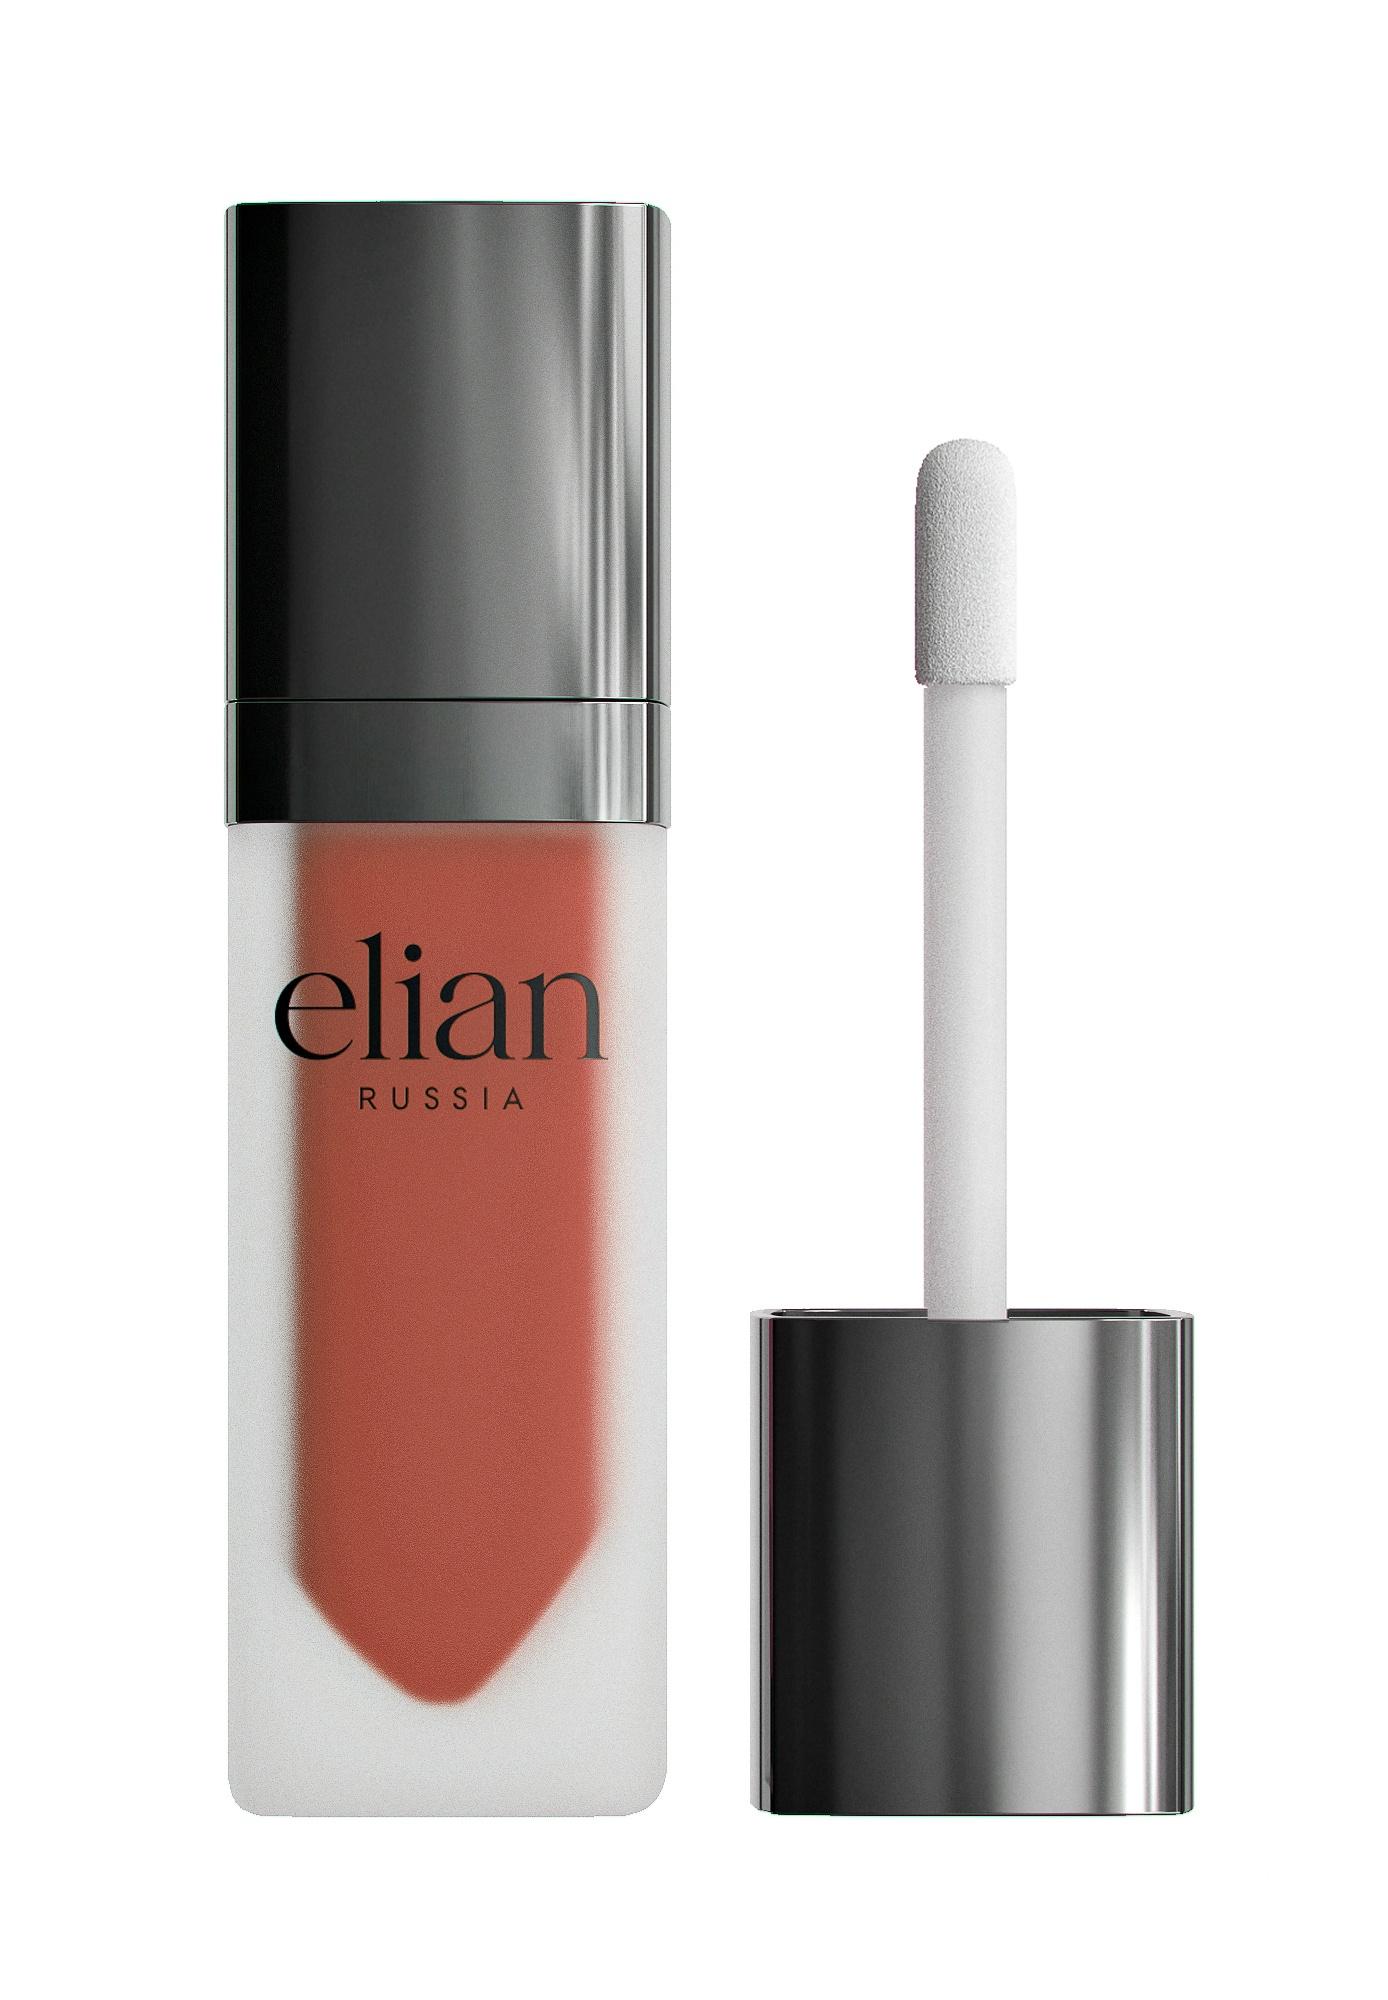 Жидкая матовая помада Superior matte liquid lipstick 204 Queen of Spades ELIAN RUSSIA цена